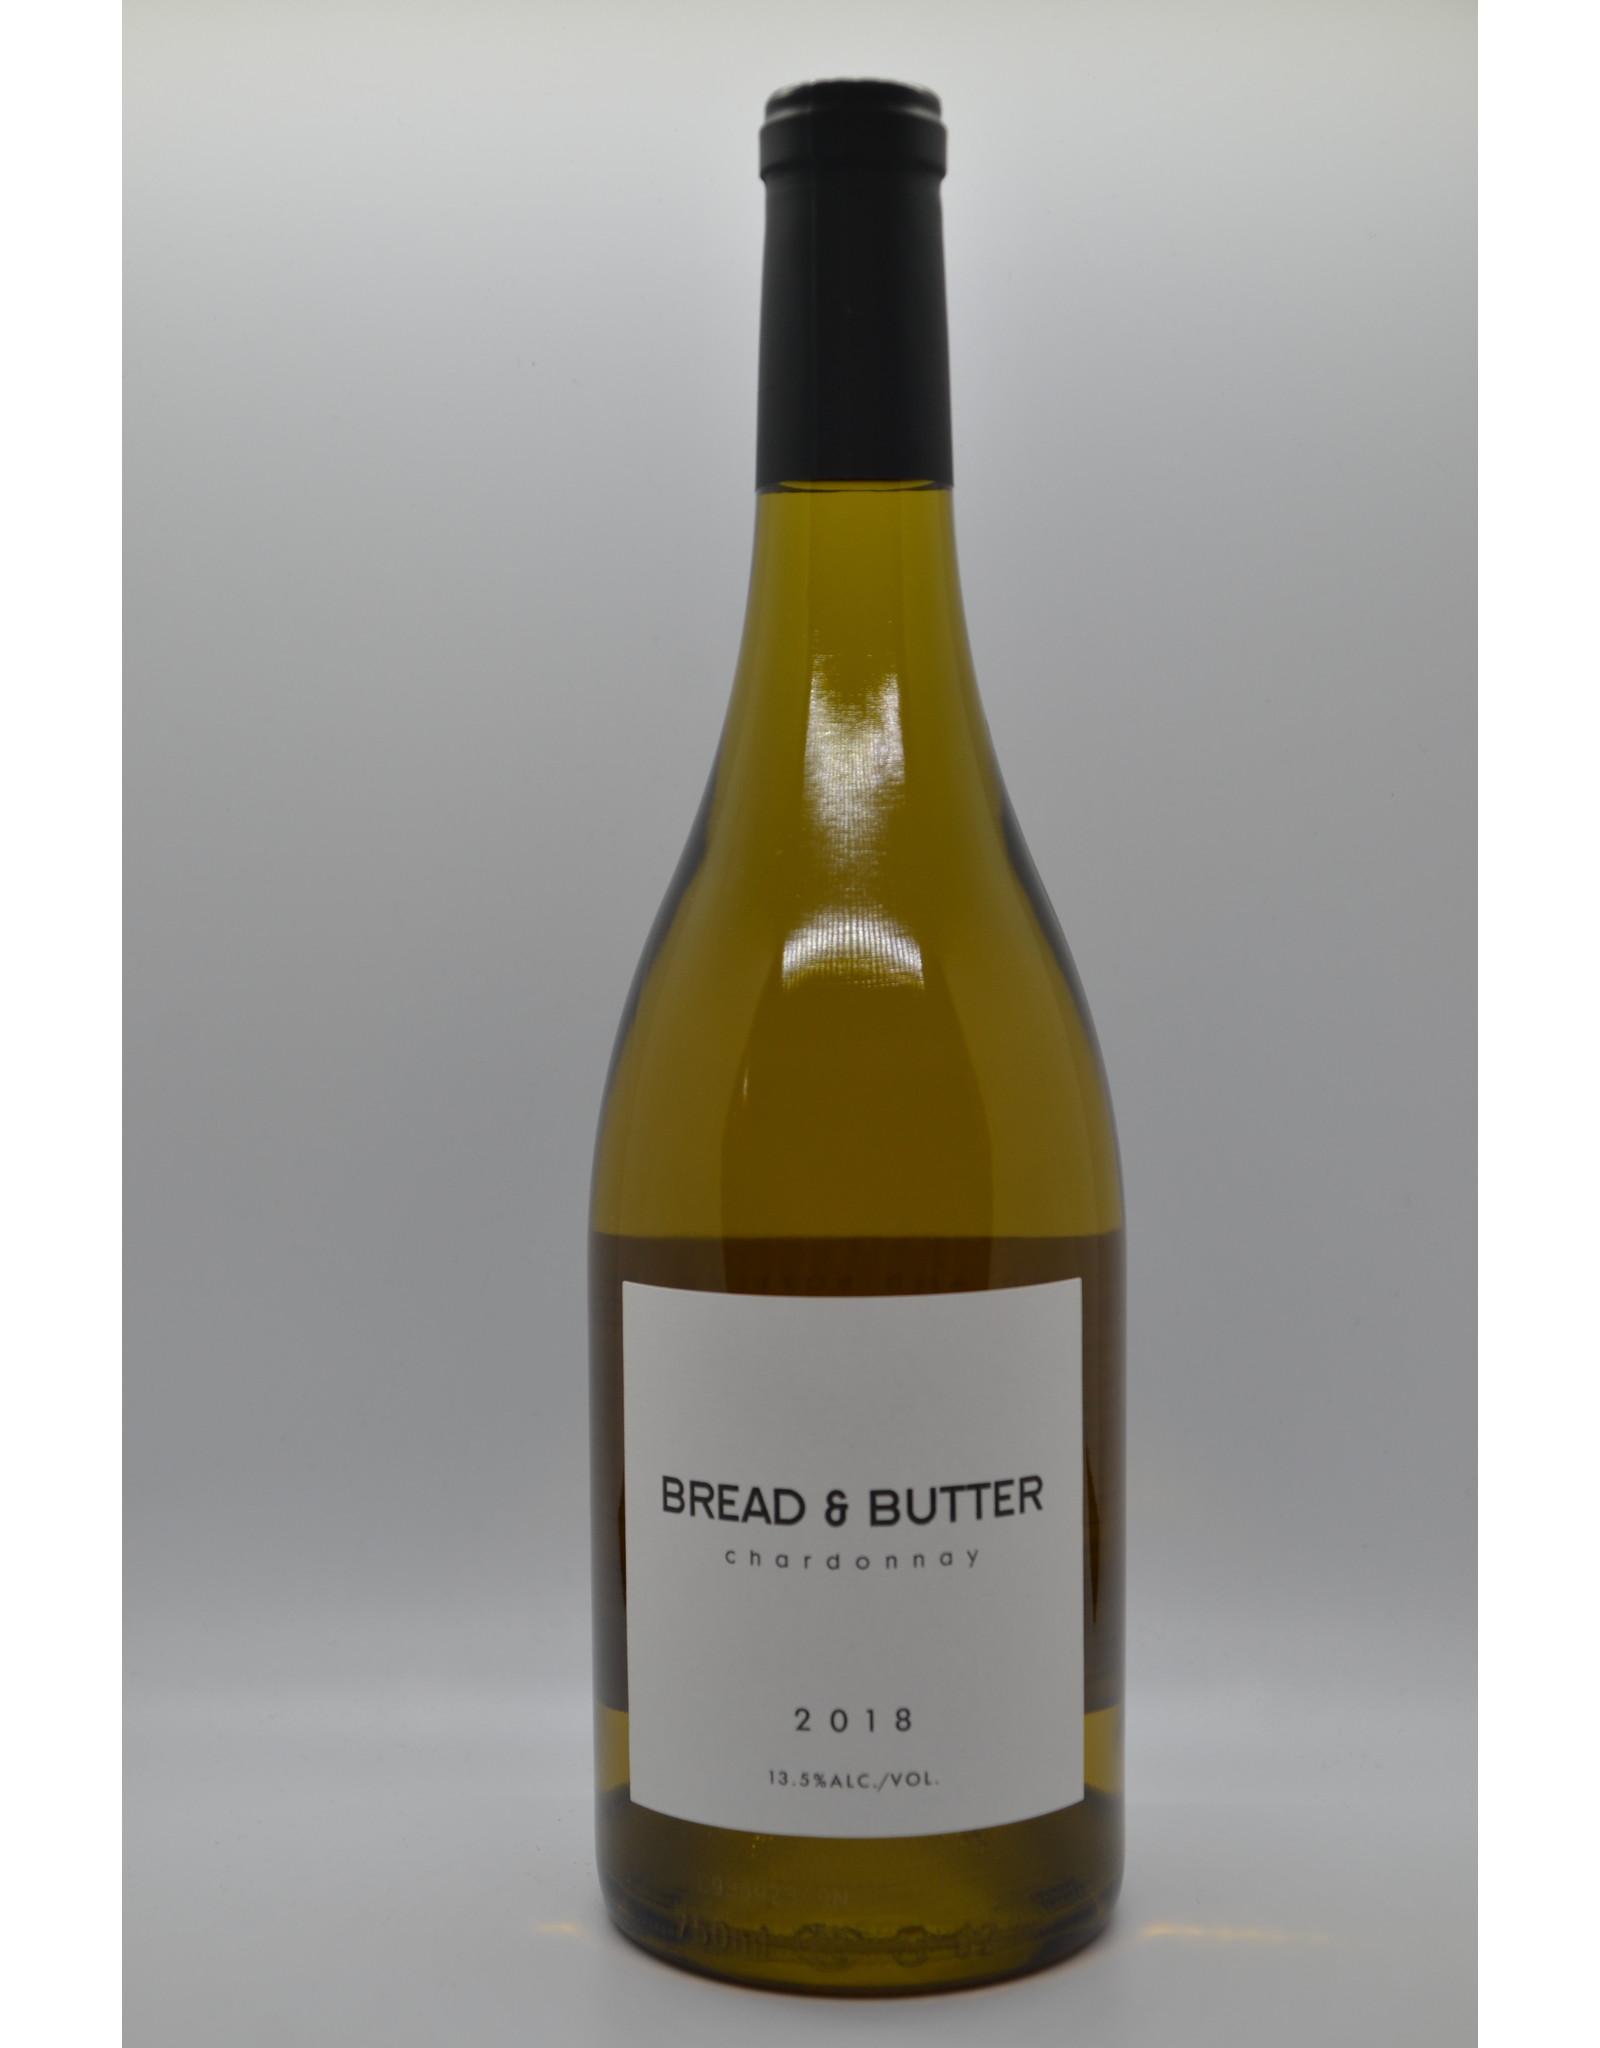 USA Bread & Butter Chardonnay